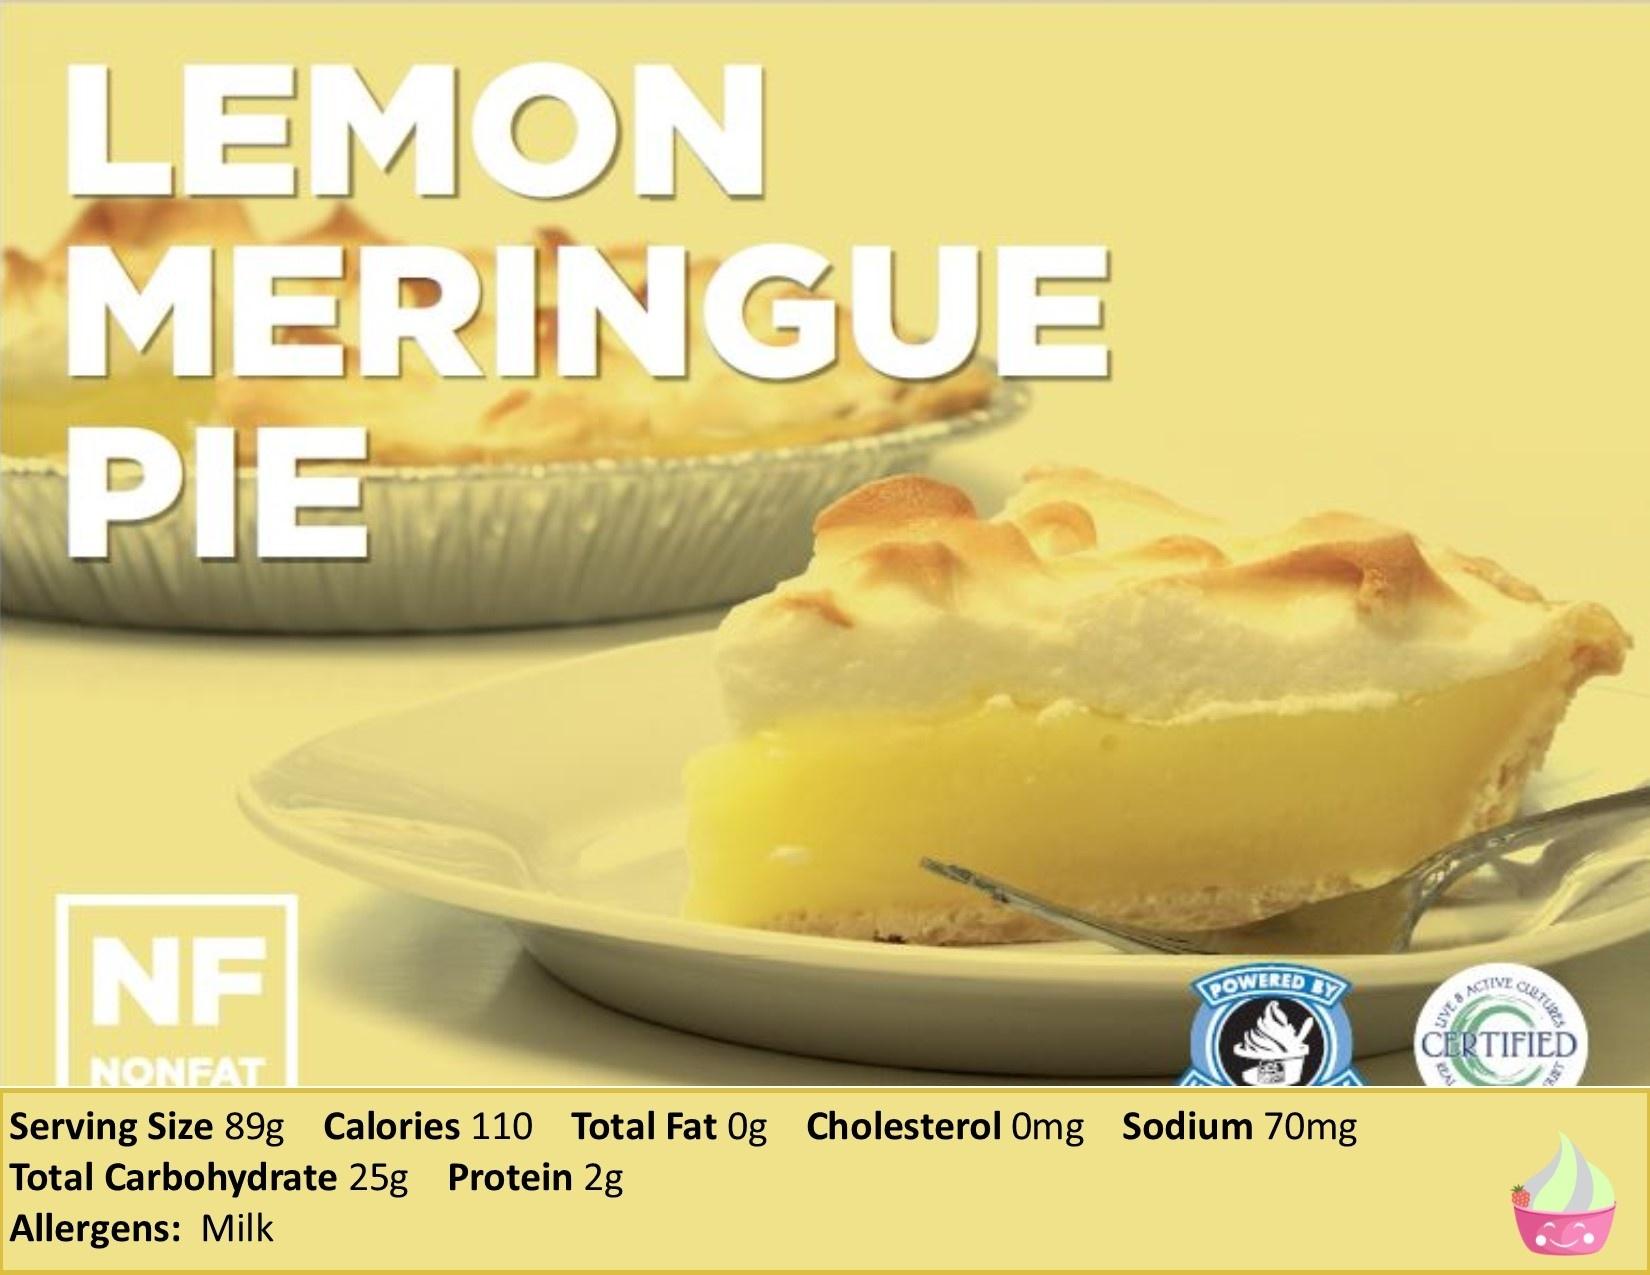 https://0201.nccdn.net/1_2/000/000/175/d0b/Lemon-Meringue-Pie-NF-1650x1275-1650x1275.jpg